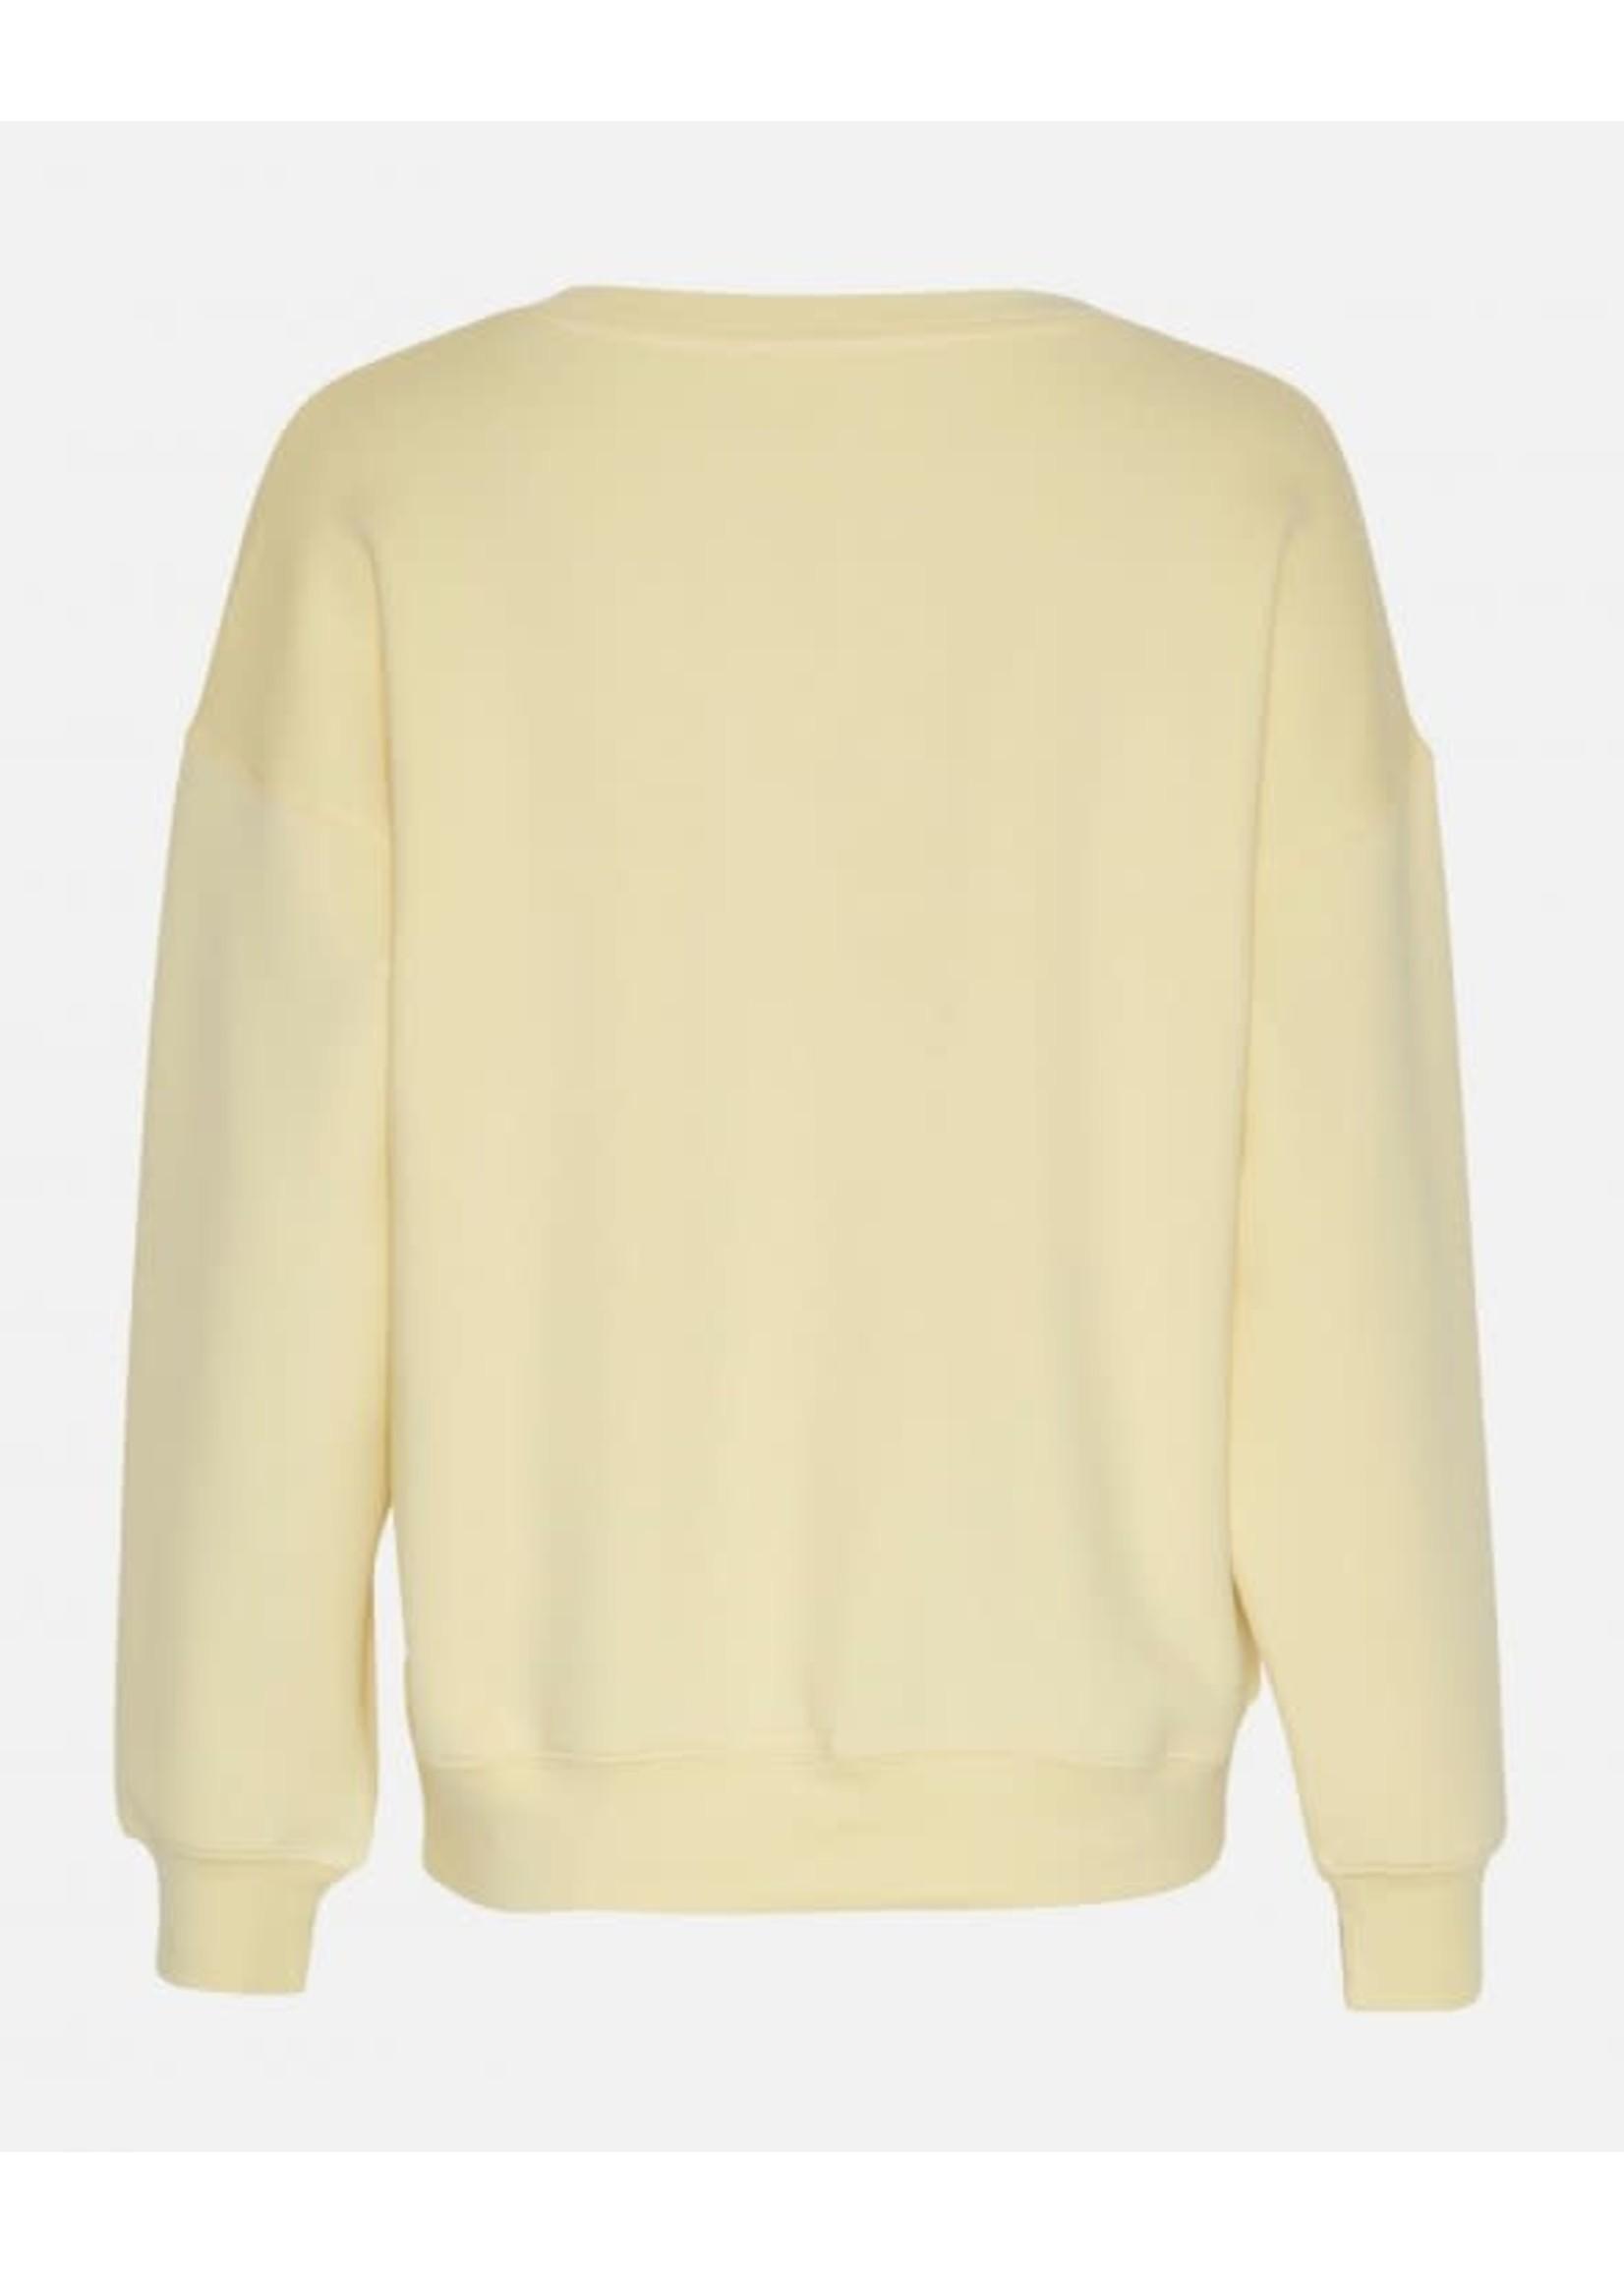 MSCH Ima DS Sweatshirt, Pale banana